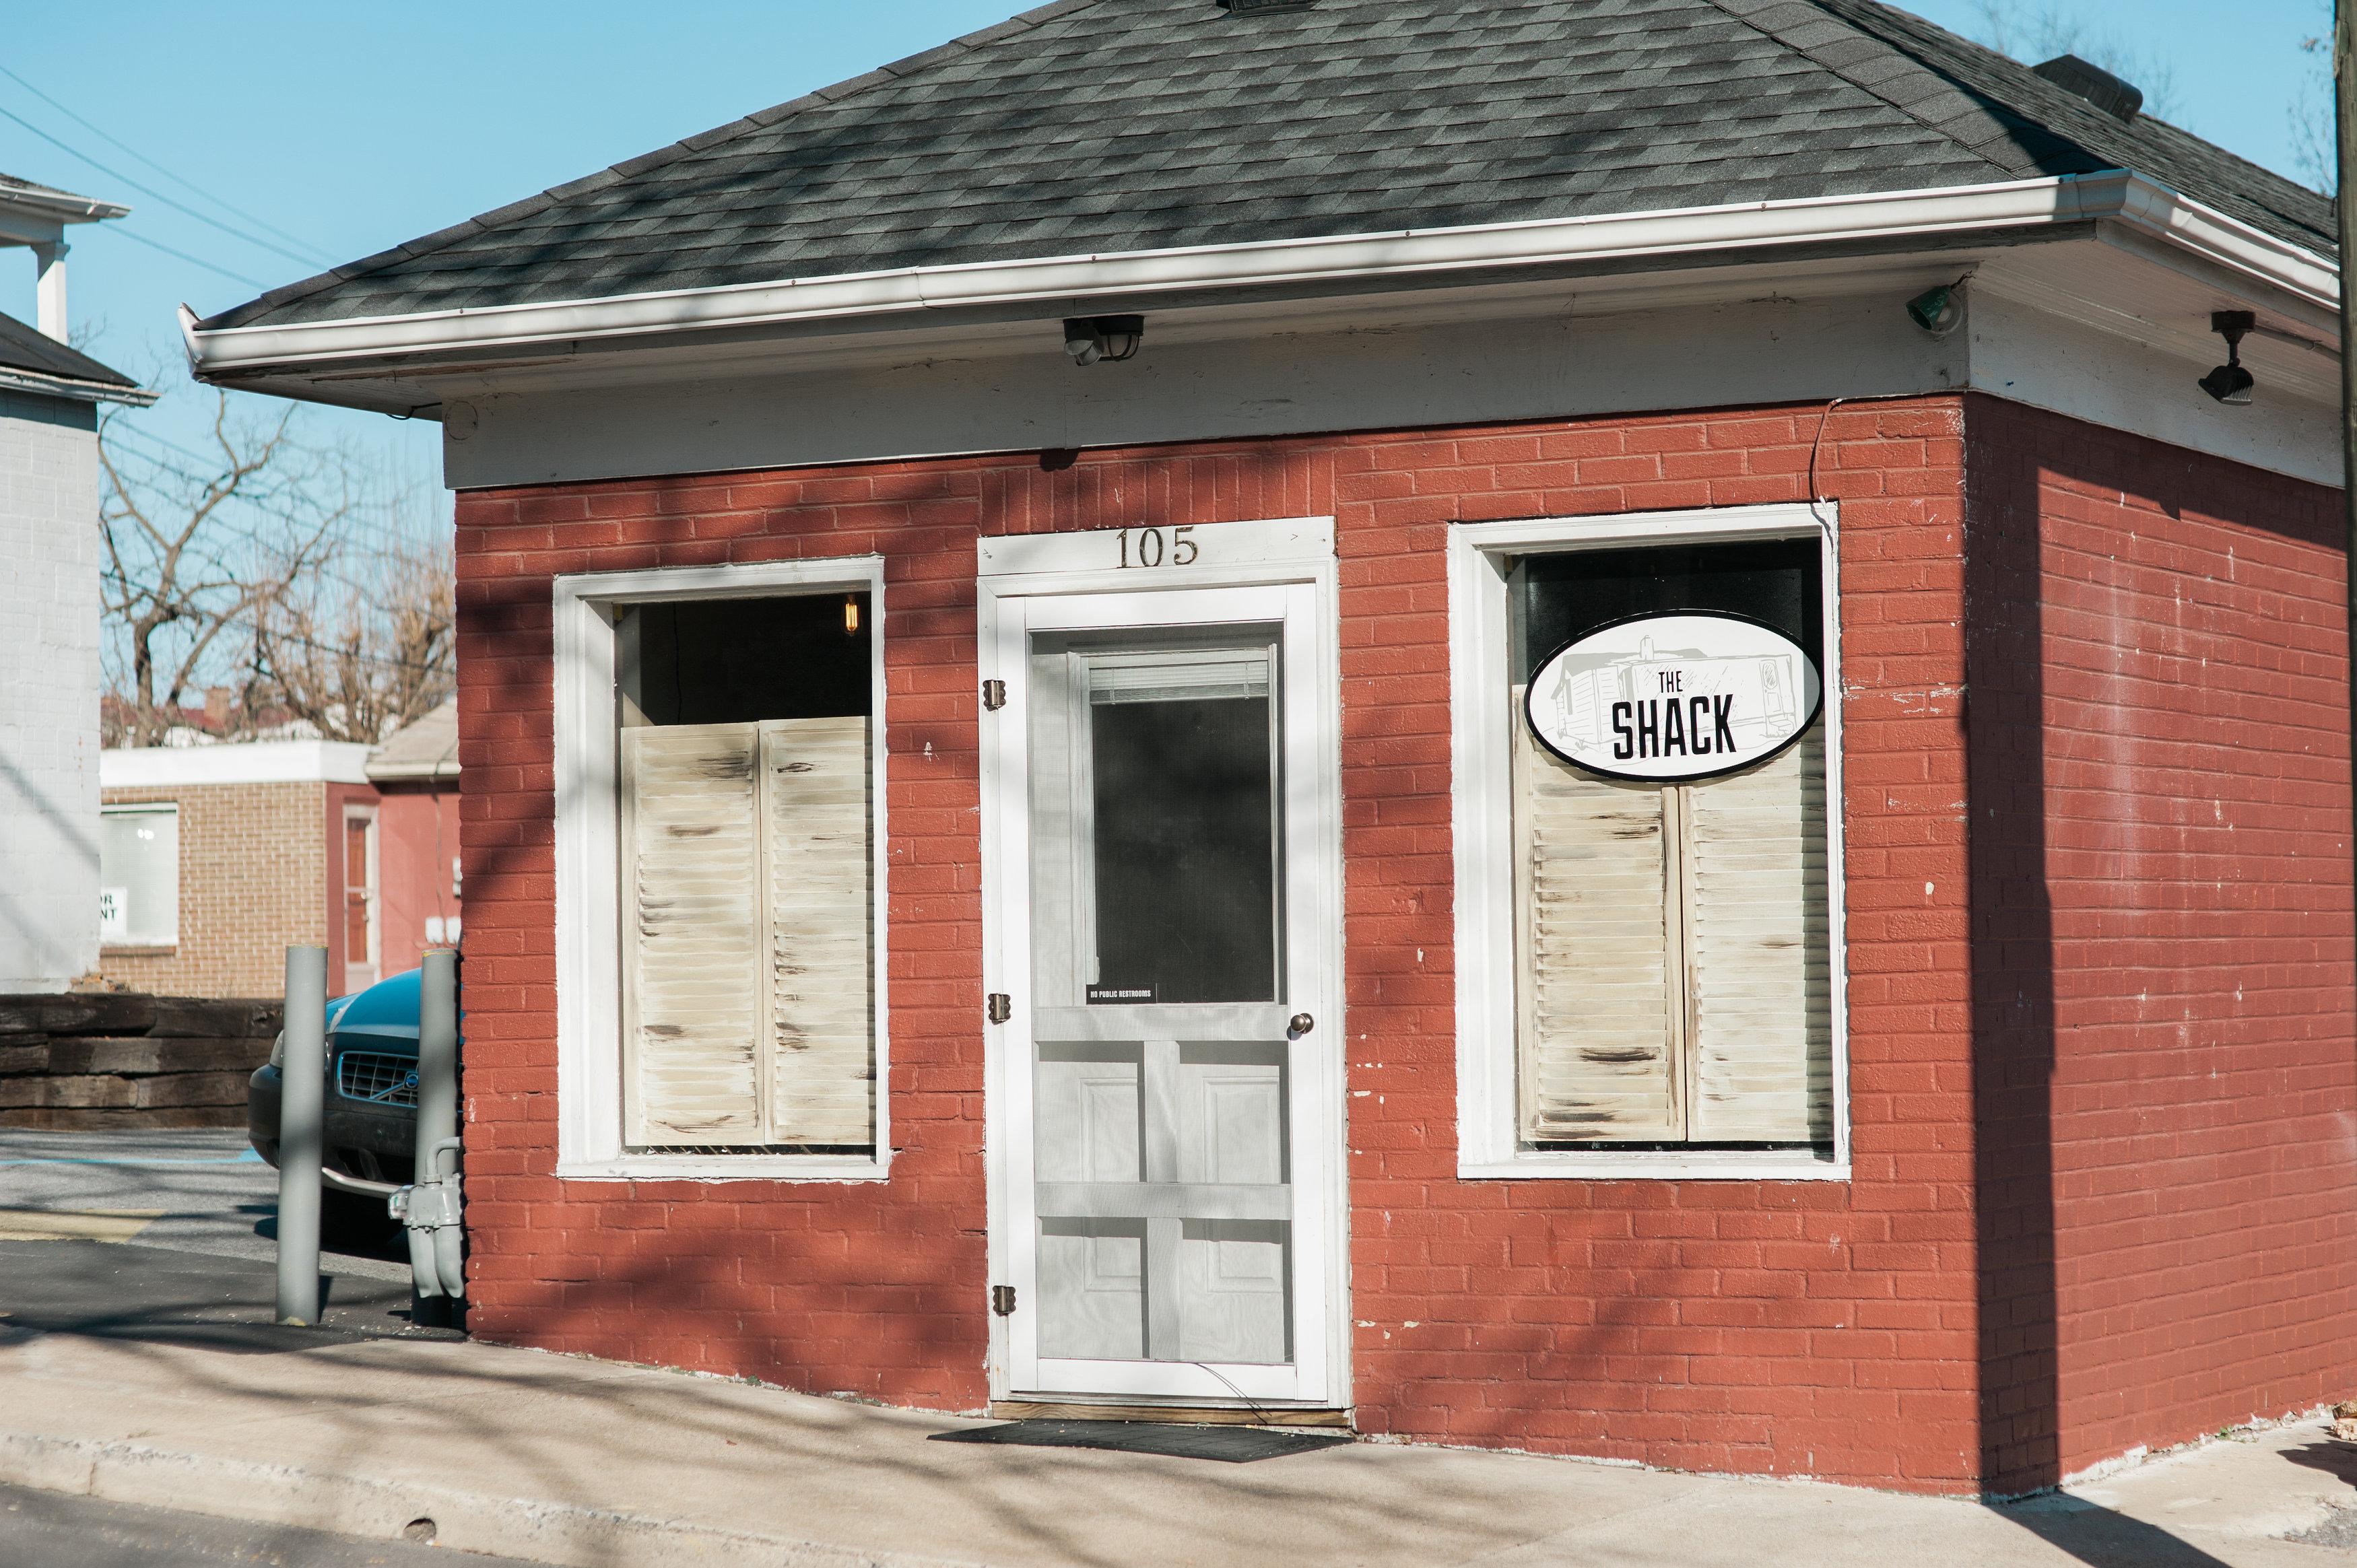 The Shack restaurant in Staunton, where Susan Weeks was an original staff member